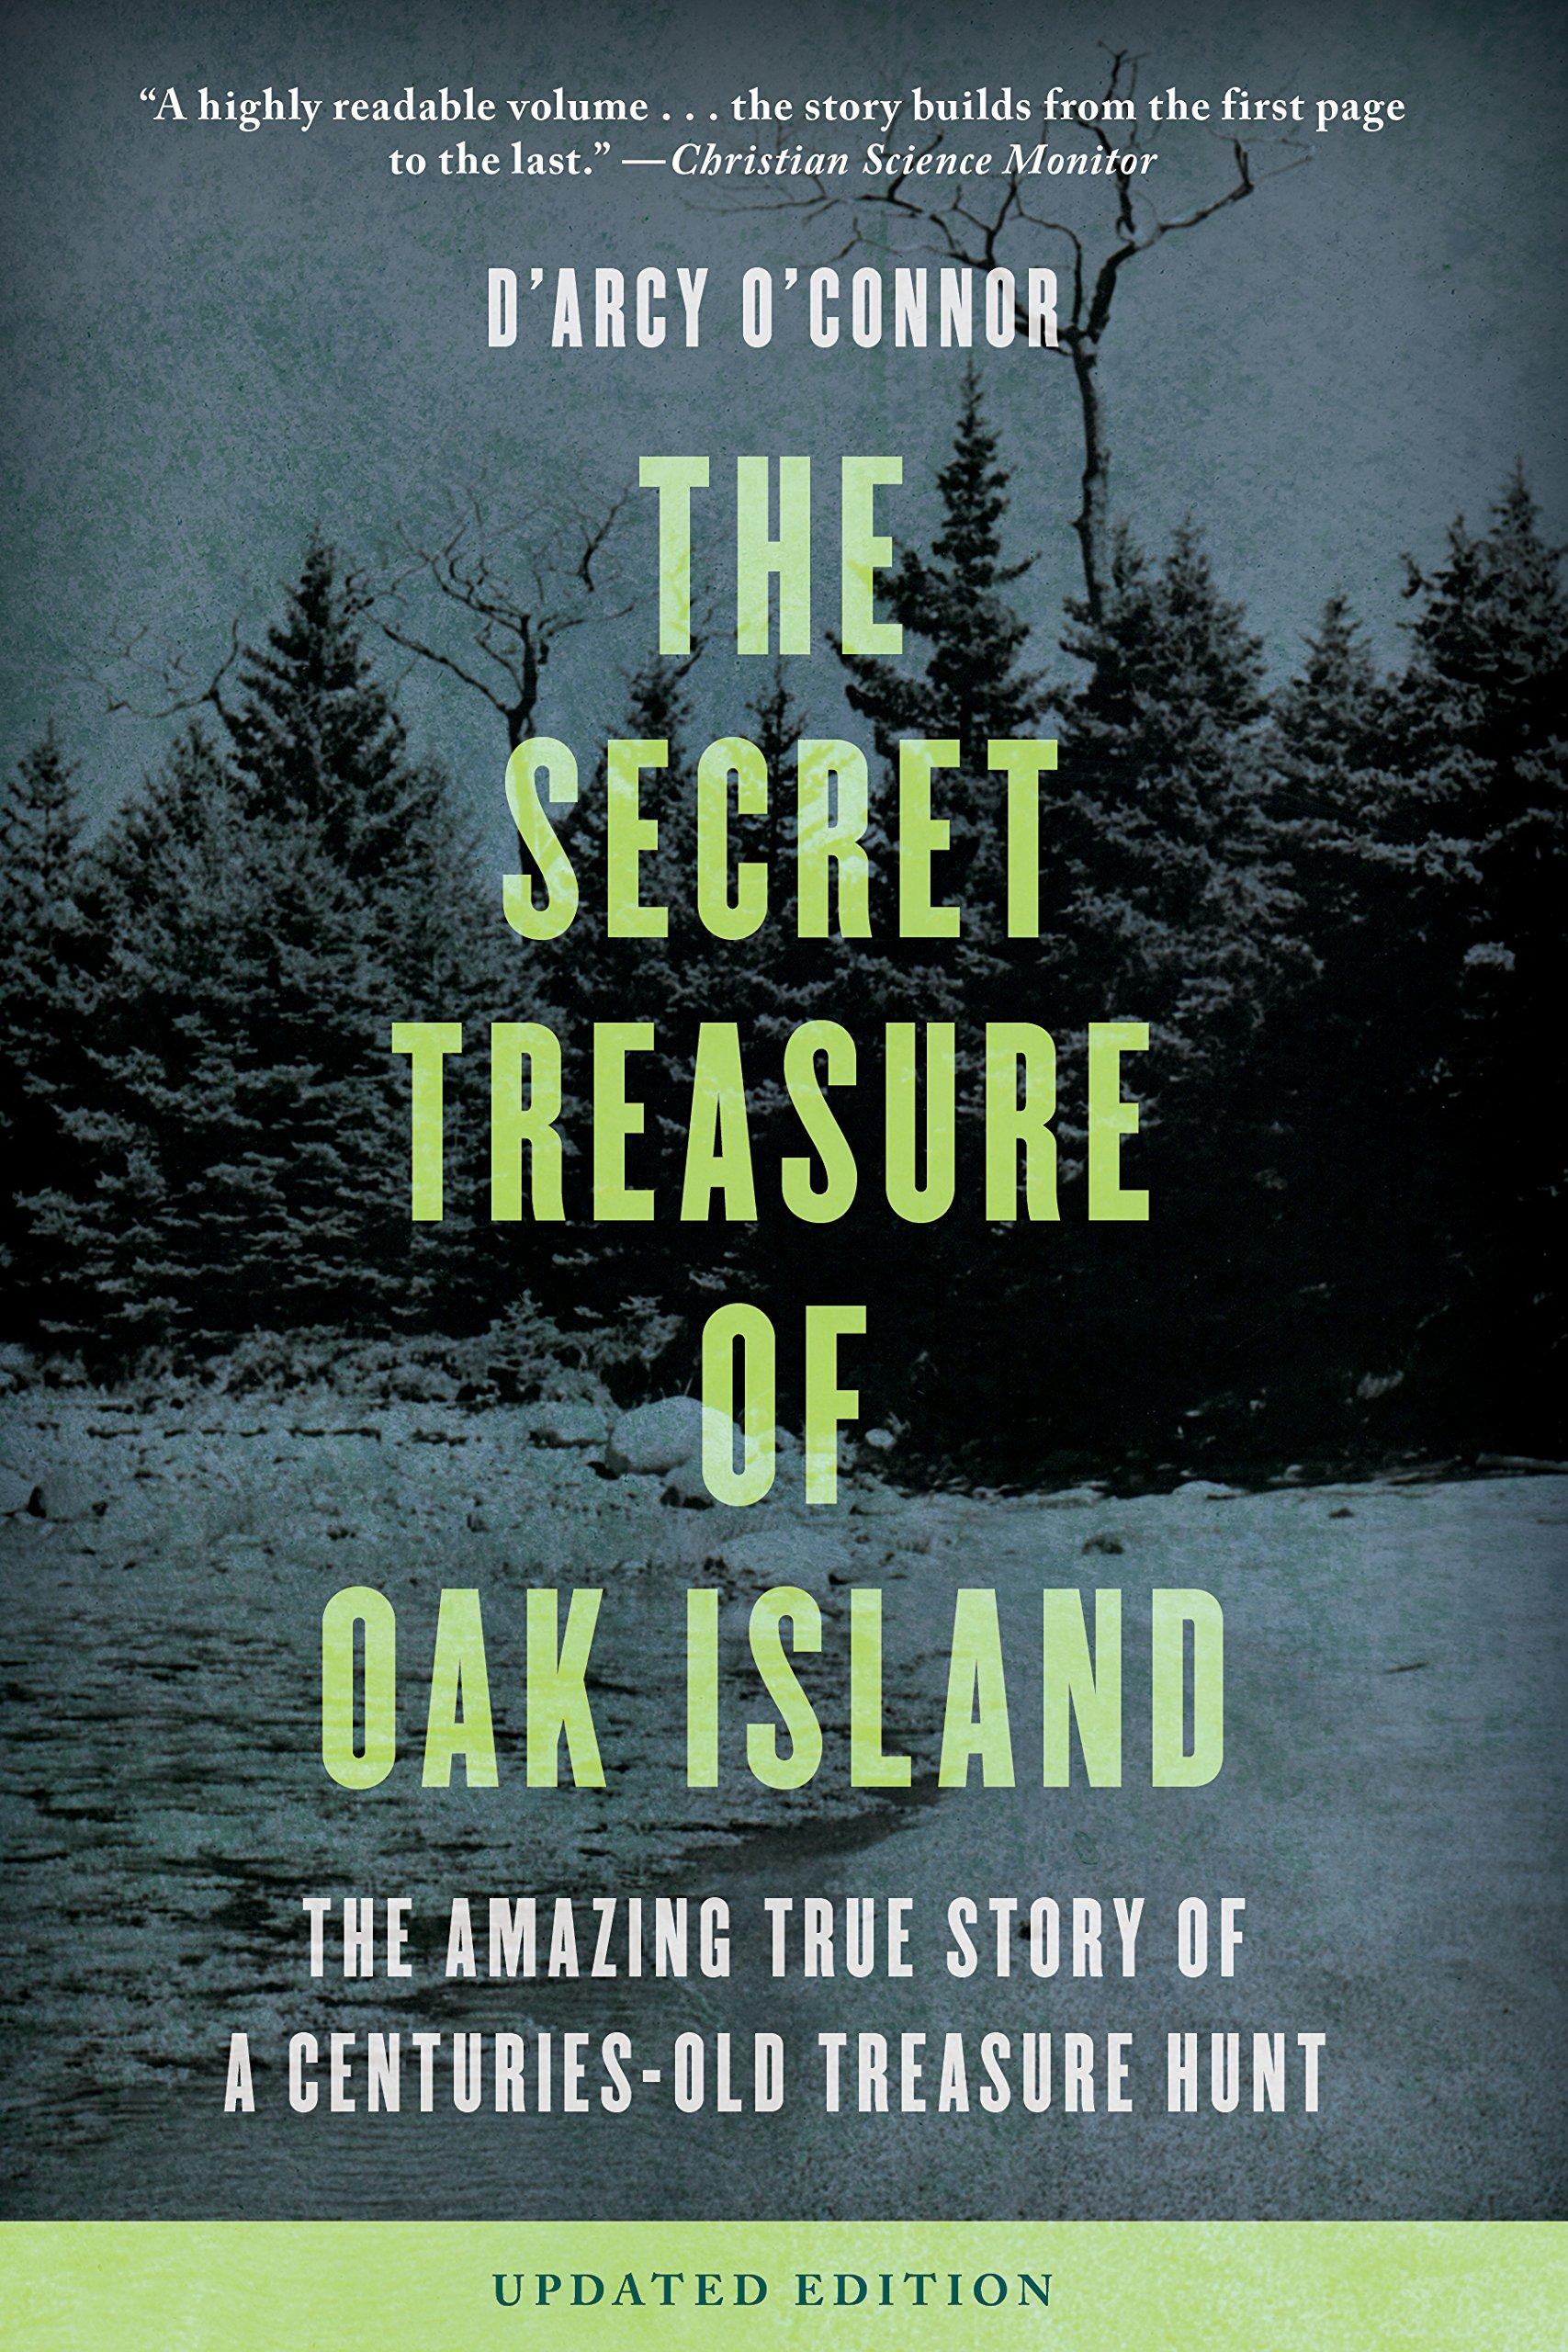 Download Secret Treasure of Oak Island: The Amazing True Story of a Centuries-Old Treasure Hunt ebook